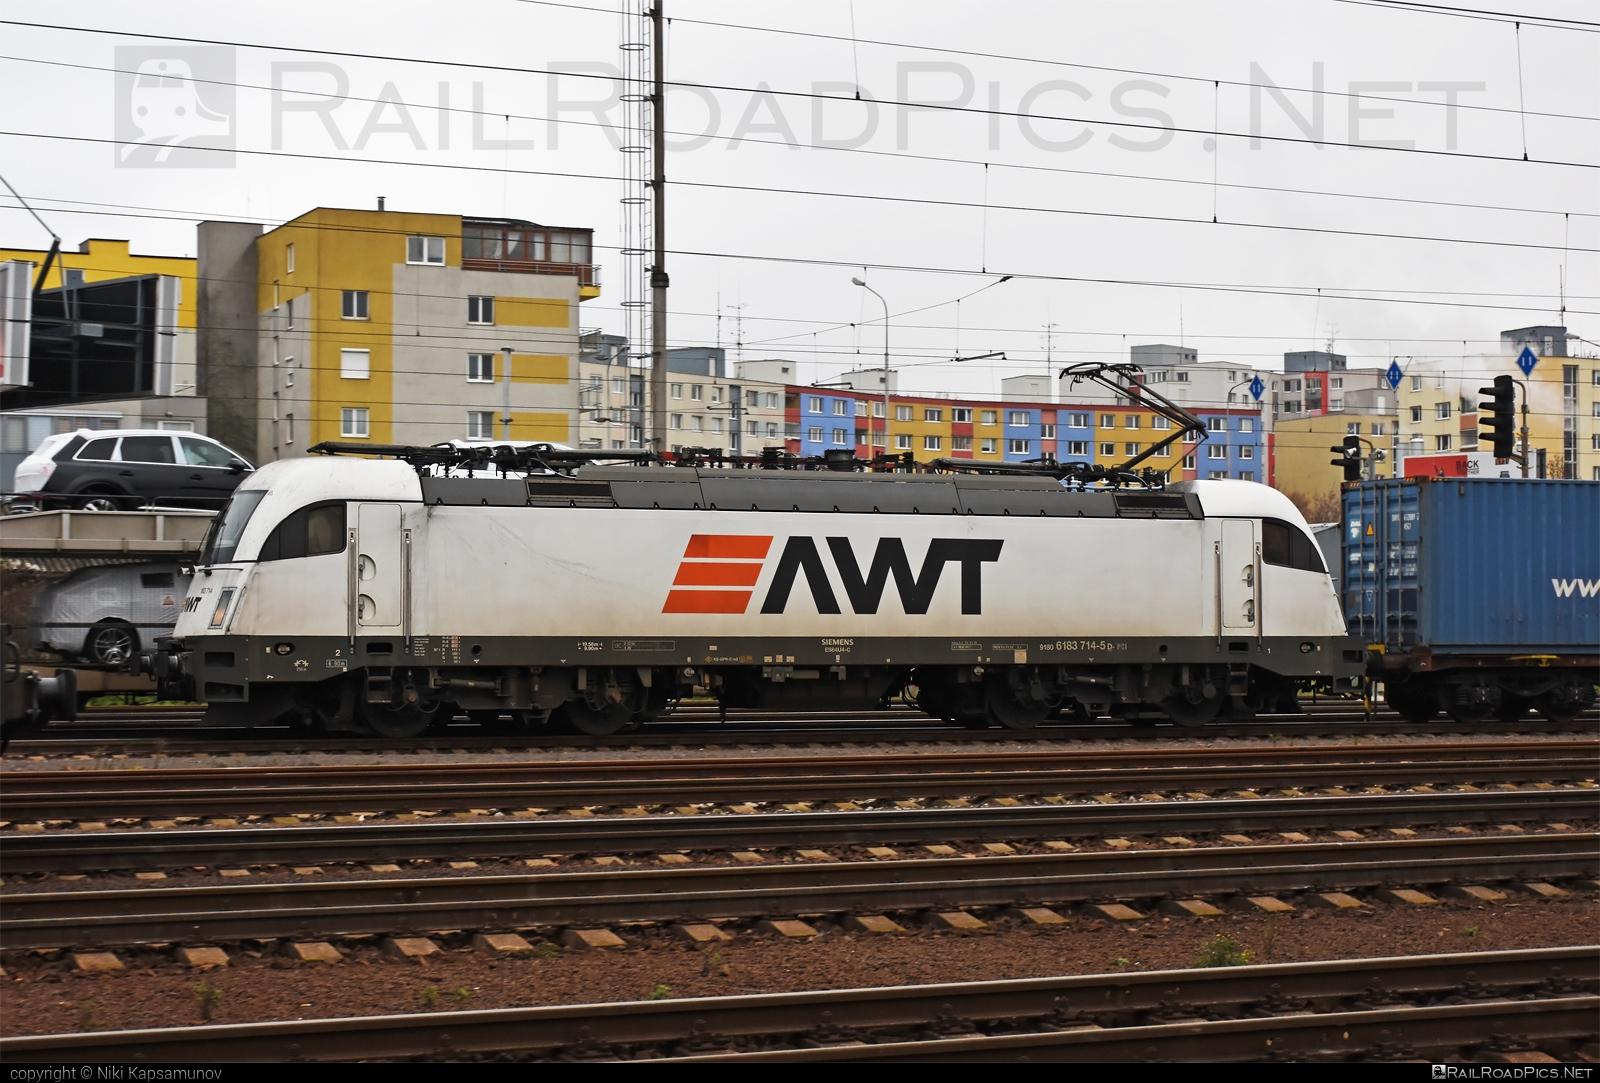 Siemens ES 64 U4 - 183 714 operated by PKP CARGO INTERNATIONAL a.s. #awt #es64 #es64u #es64u4 #eurosprinter #pkpcargointernational #pkpcargointernationalas #siemens #siemenses64 #siemenses64u #siemenses64u4 #siemenstaurus #taurus #tauruslocomotive